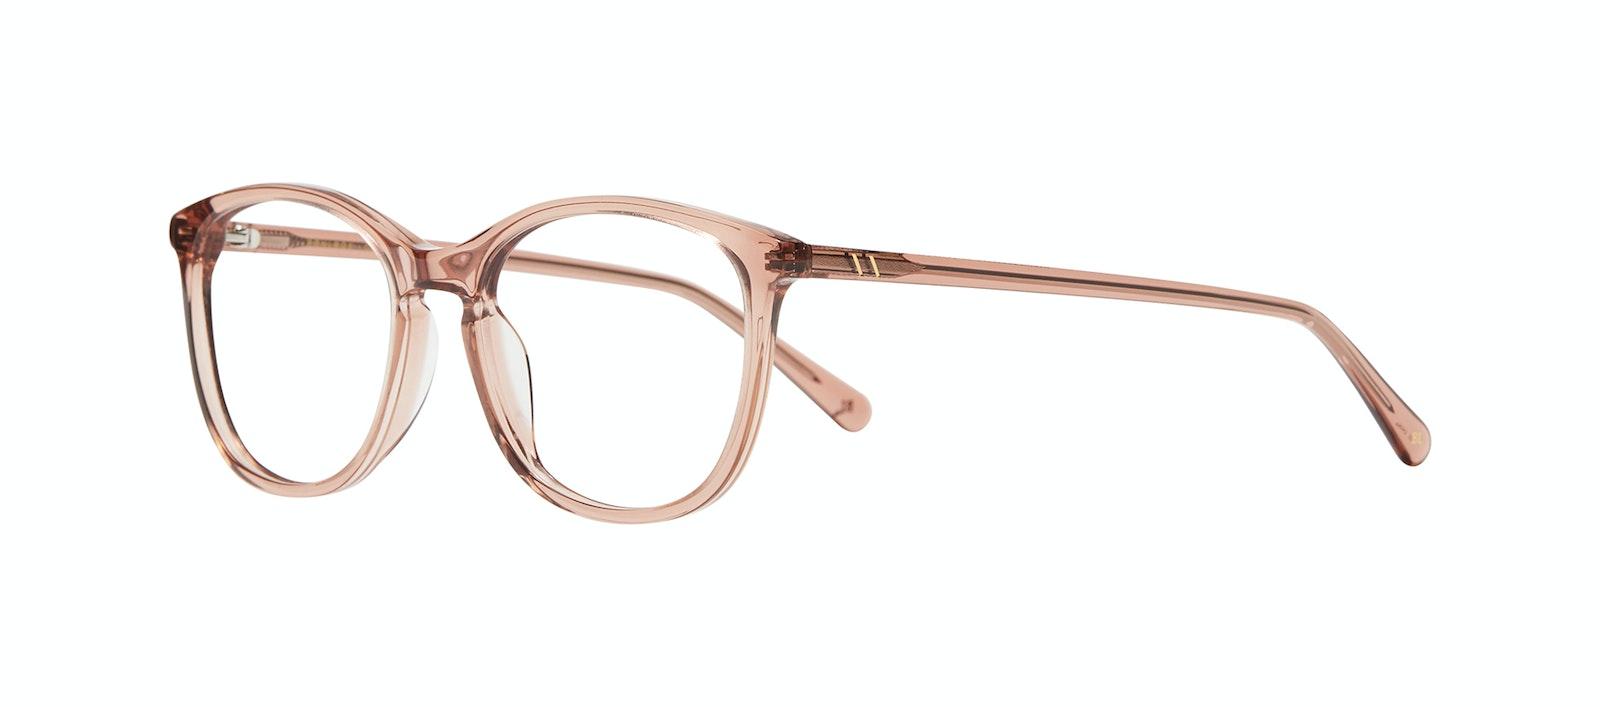 Affordable Fashion Glasses Rectangle Square Round Eyeglasses Women Nadine XL Rose Tilt